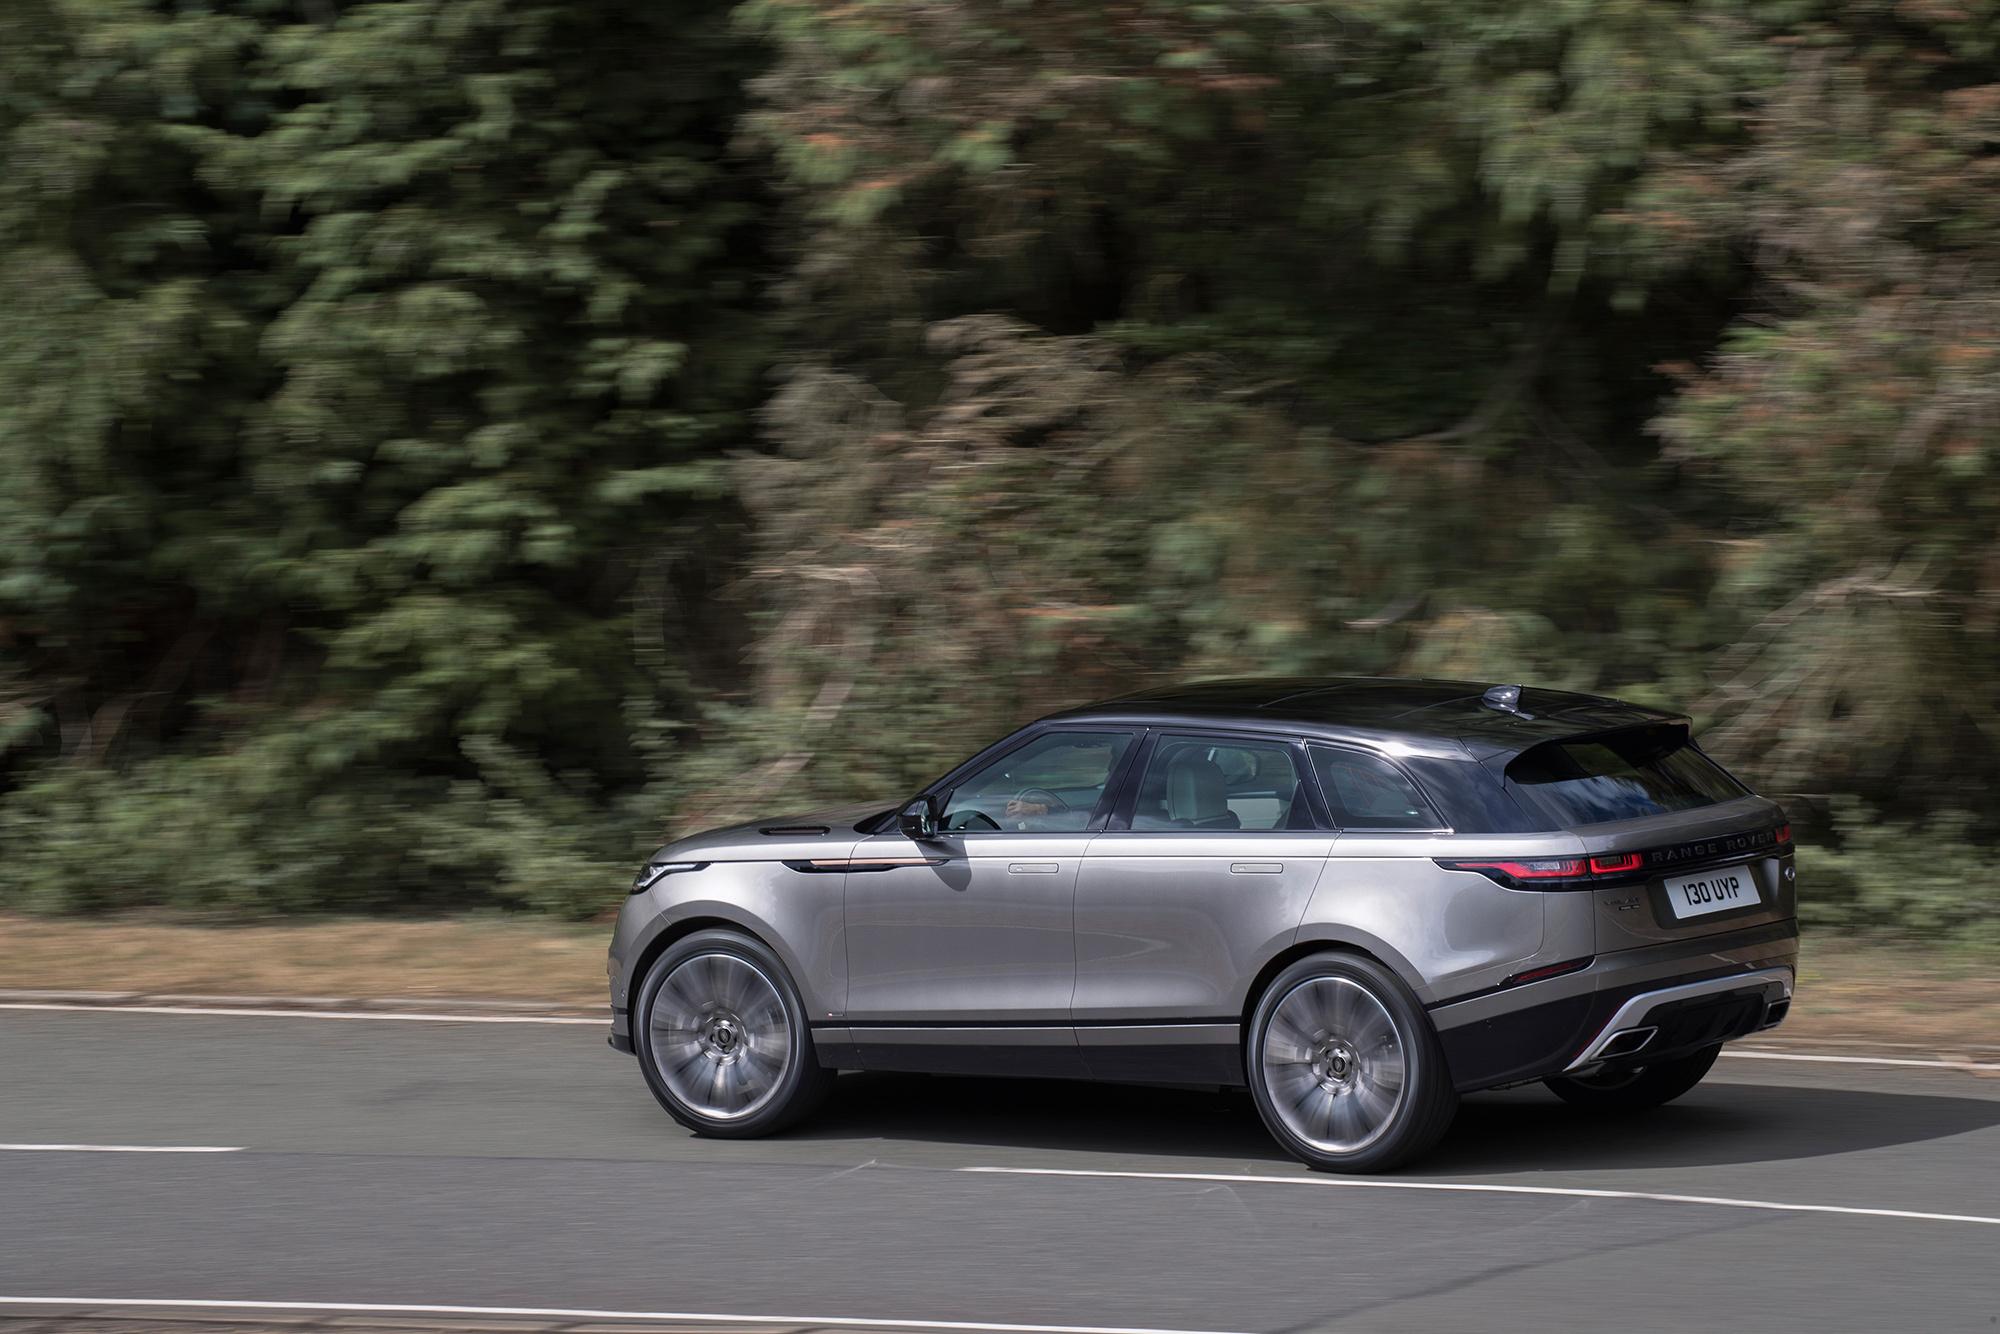 Range Rover Velar Free HD Wallpapers